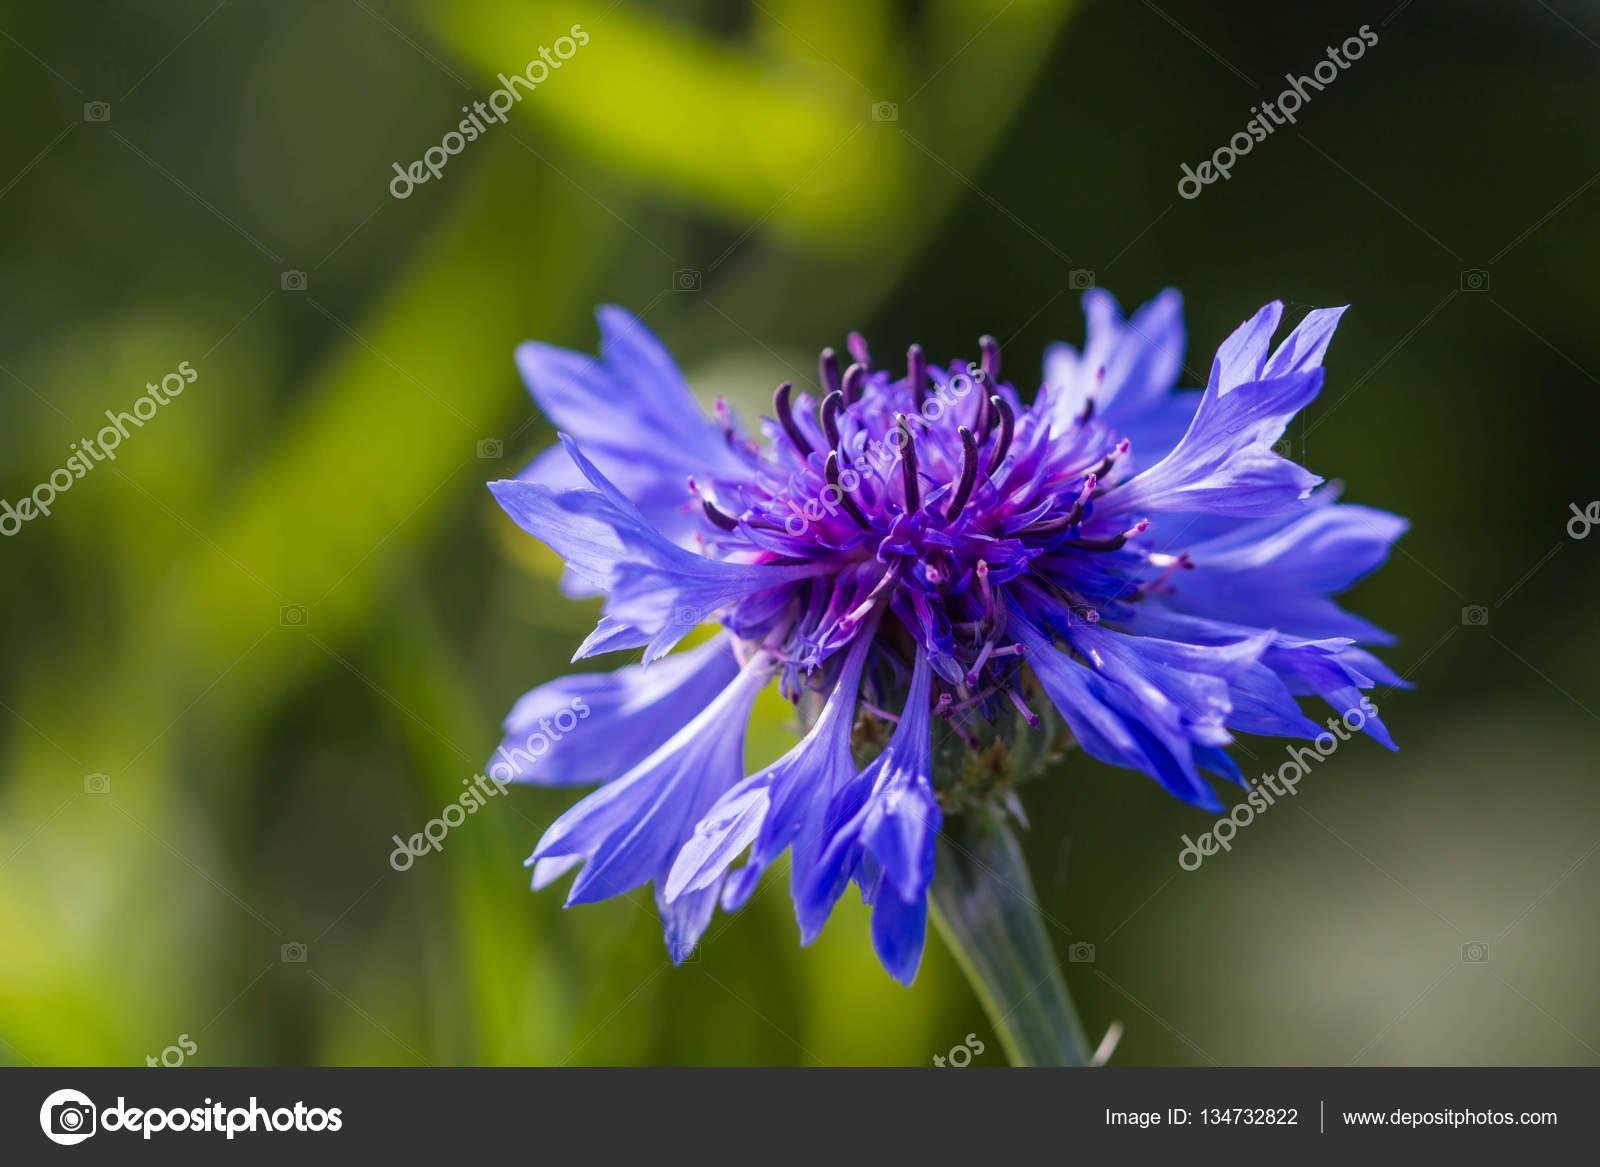 Beautiful blue winter flowers on nature stock photo beautiful blue winter flowers on nature photo by nawinnachiangmai izmirmasajfo